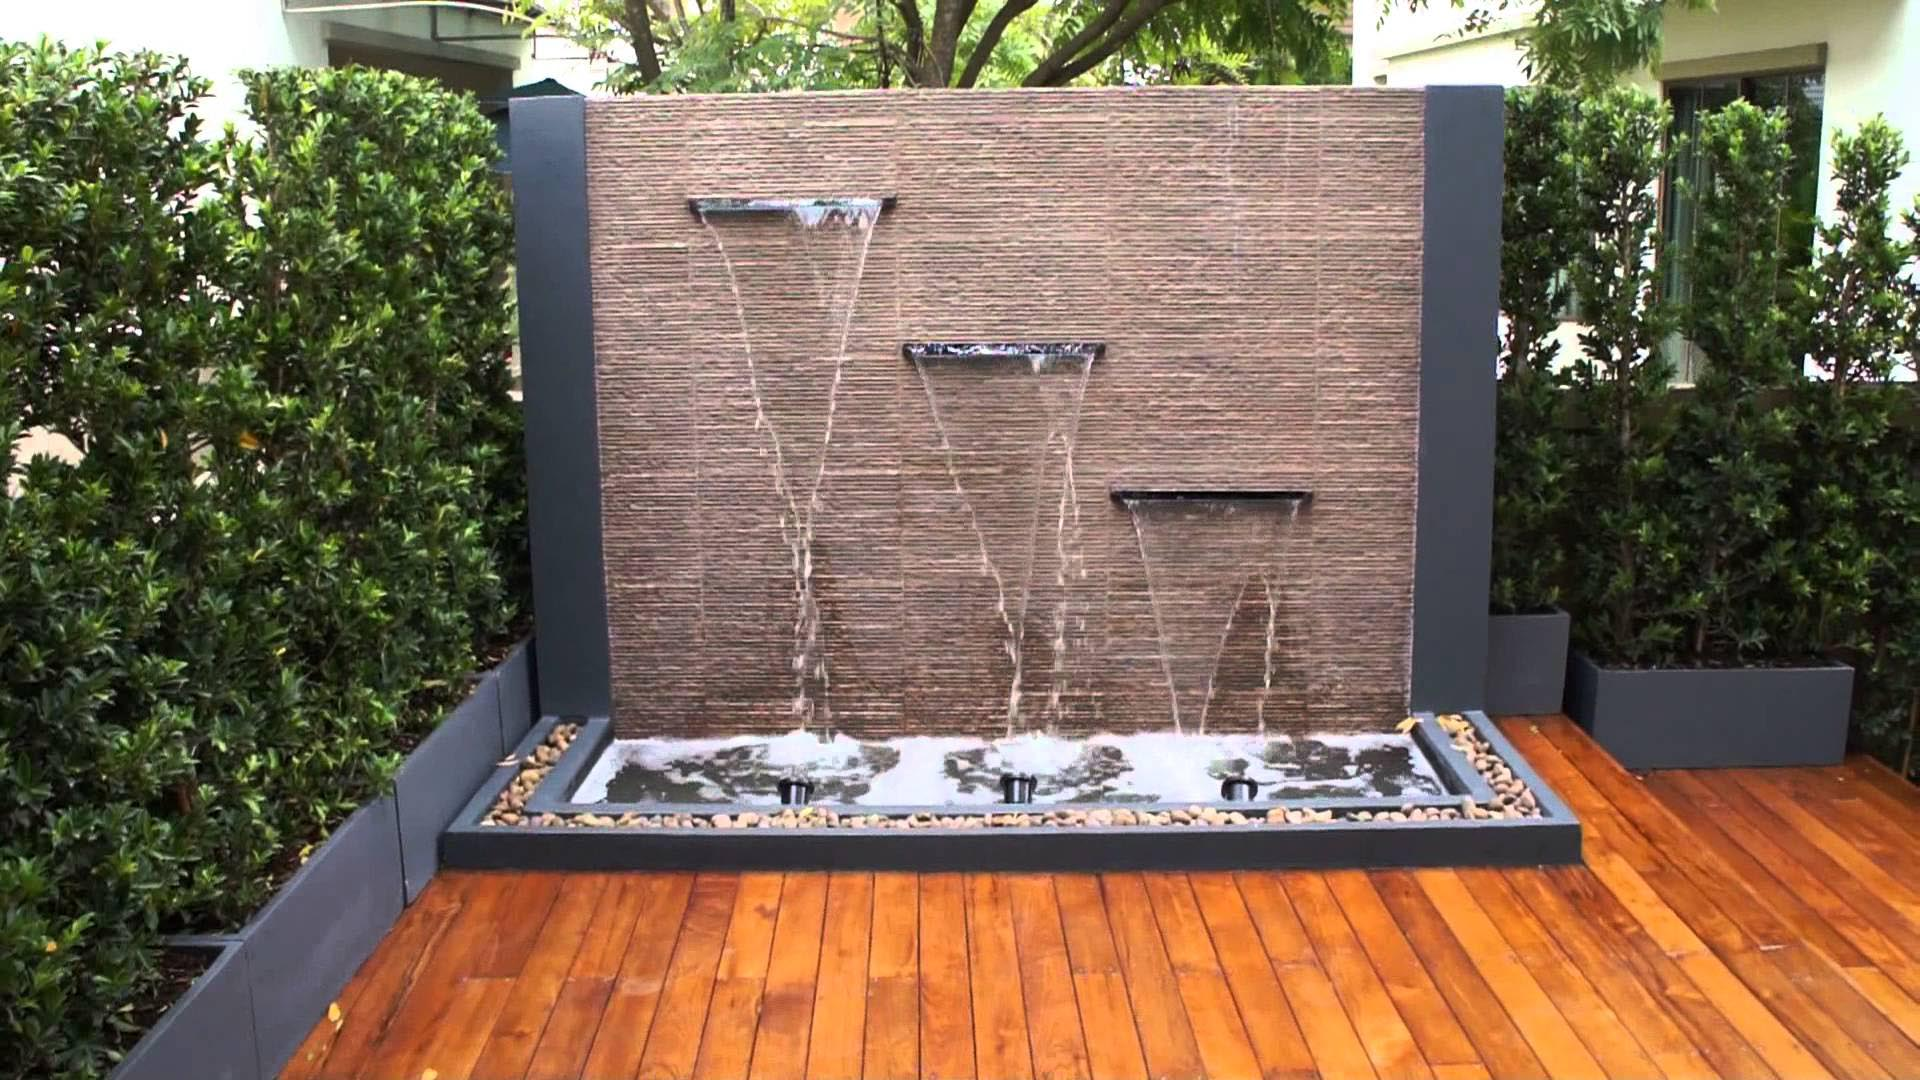 DIY Water Feature Wall | Backyard Design Ideas on Backyard Feature Walls  id=87051